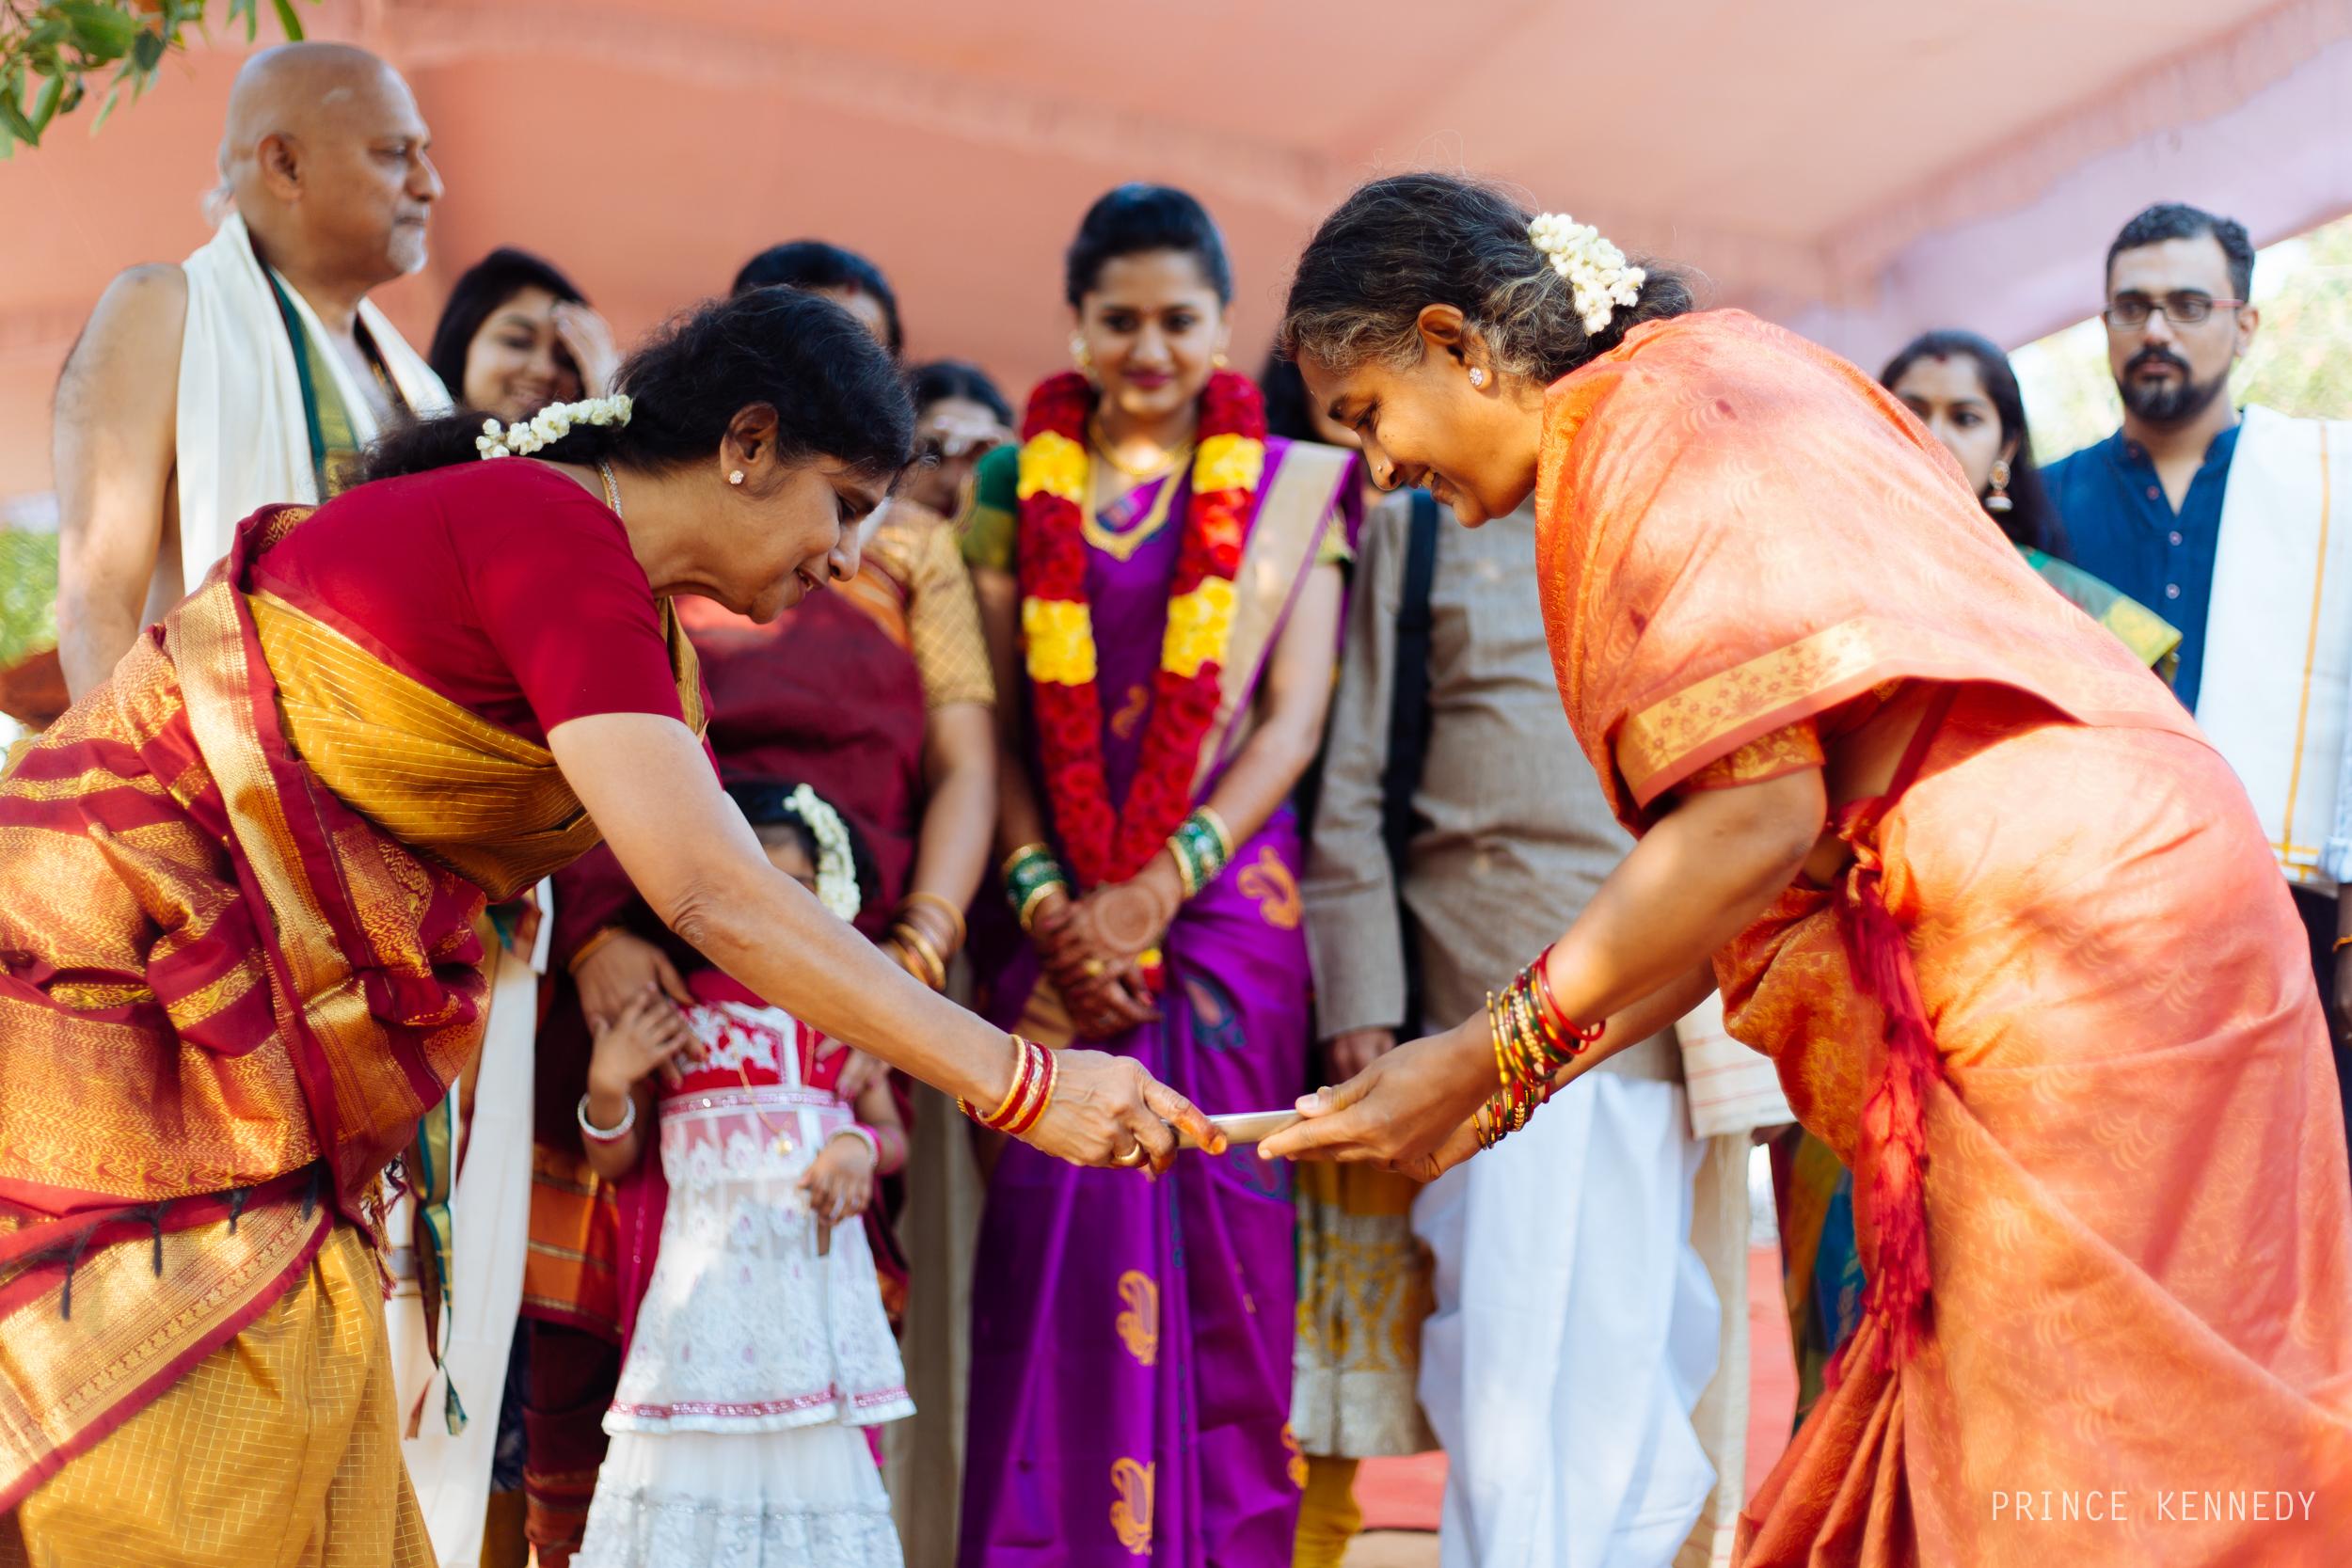 Athmajja-Nithesh-Engagement-Couple-Portrait-Portraiture-Wedding-Couple-Portrait-Chennai-Photographer-Candid-Photography-Destination-Best-Prince-Kennedy-Photography-45.jpg